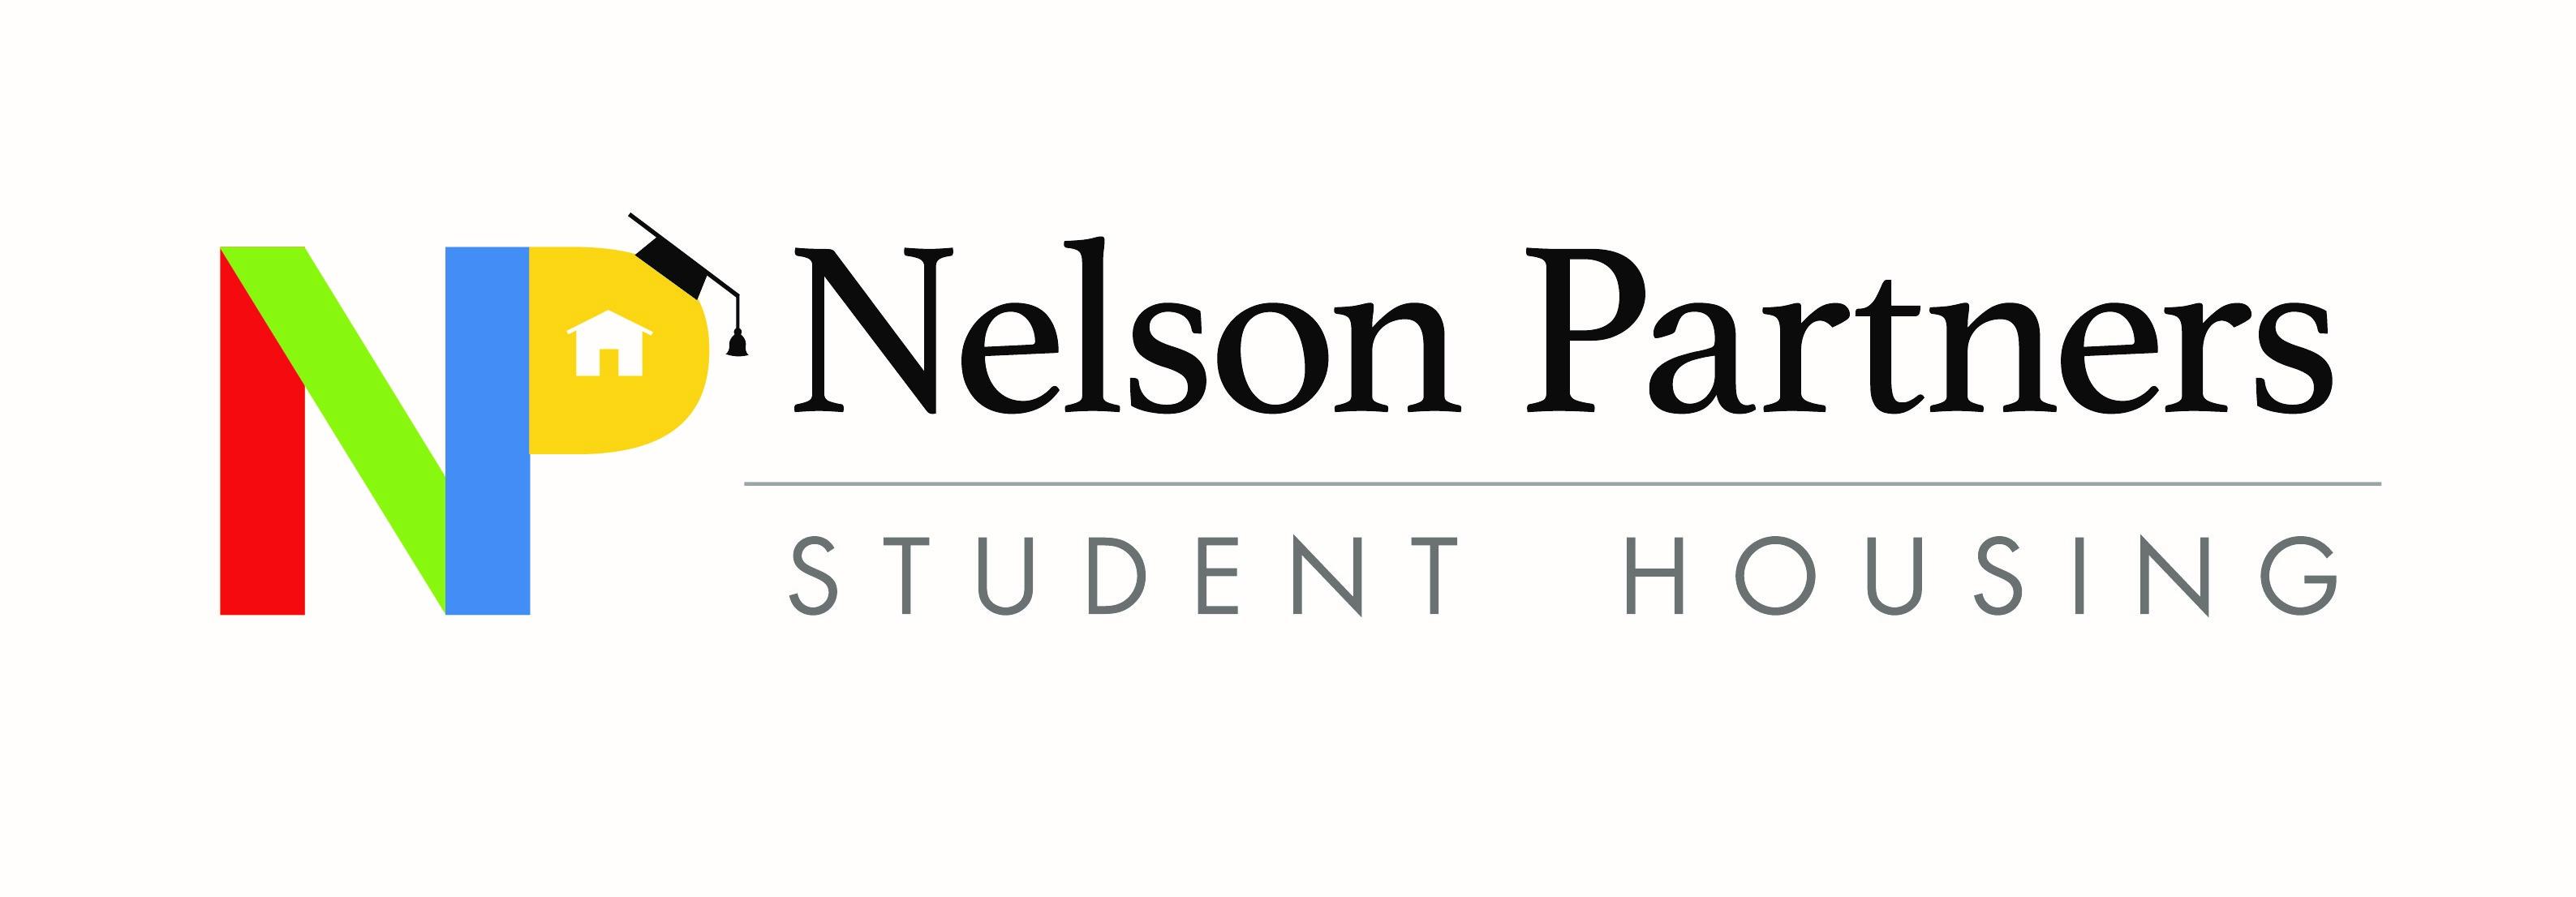 Nelson Partners logo